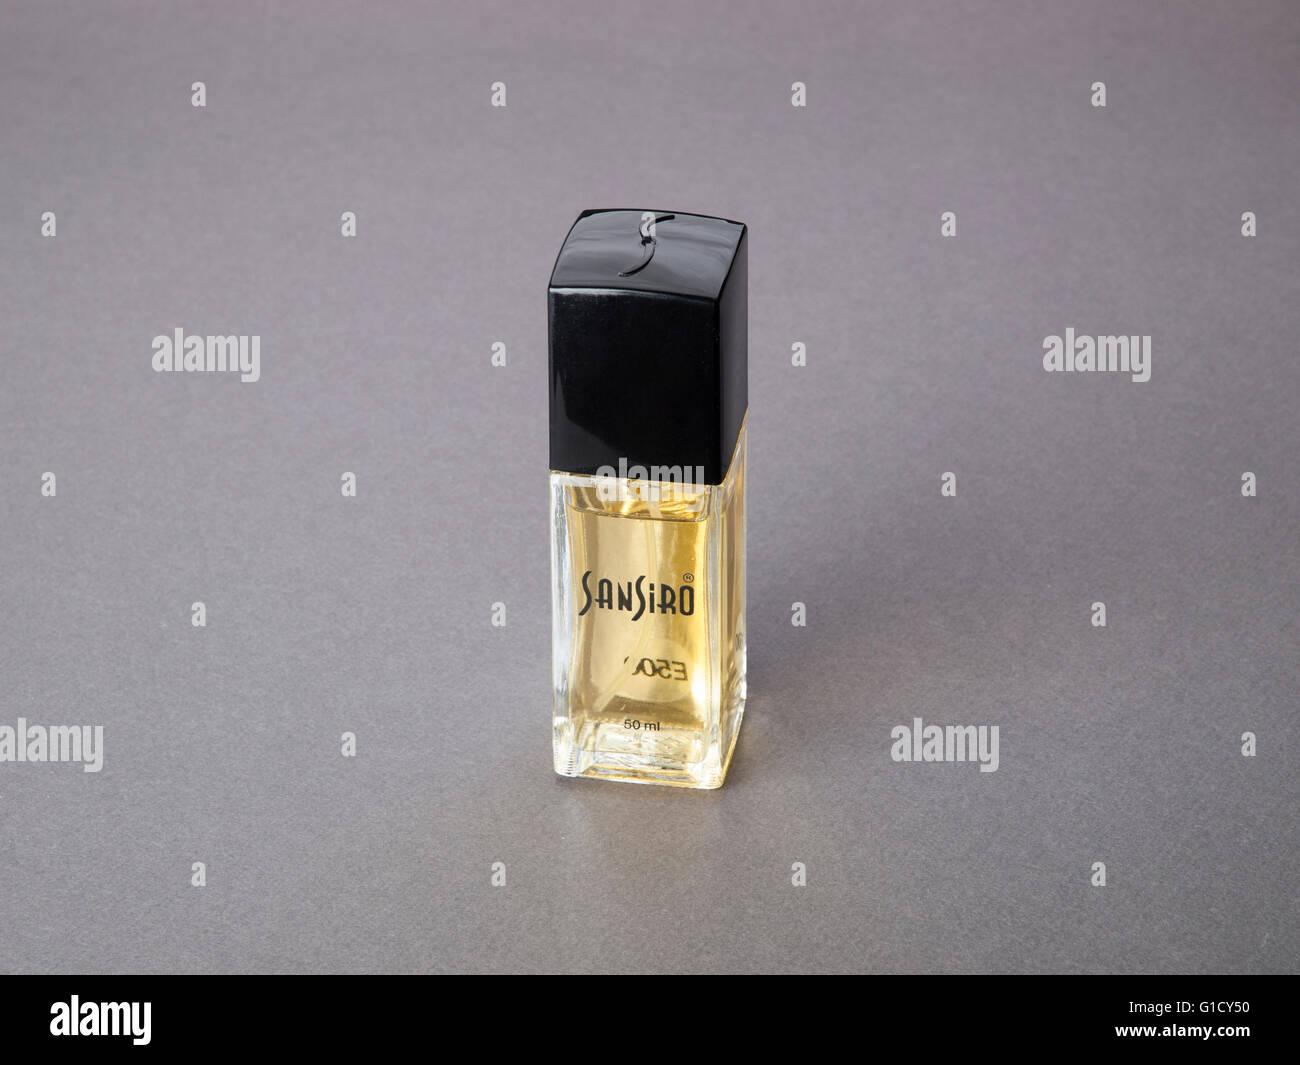 Bottle of Sansiro perfume - Stock Image